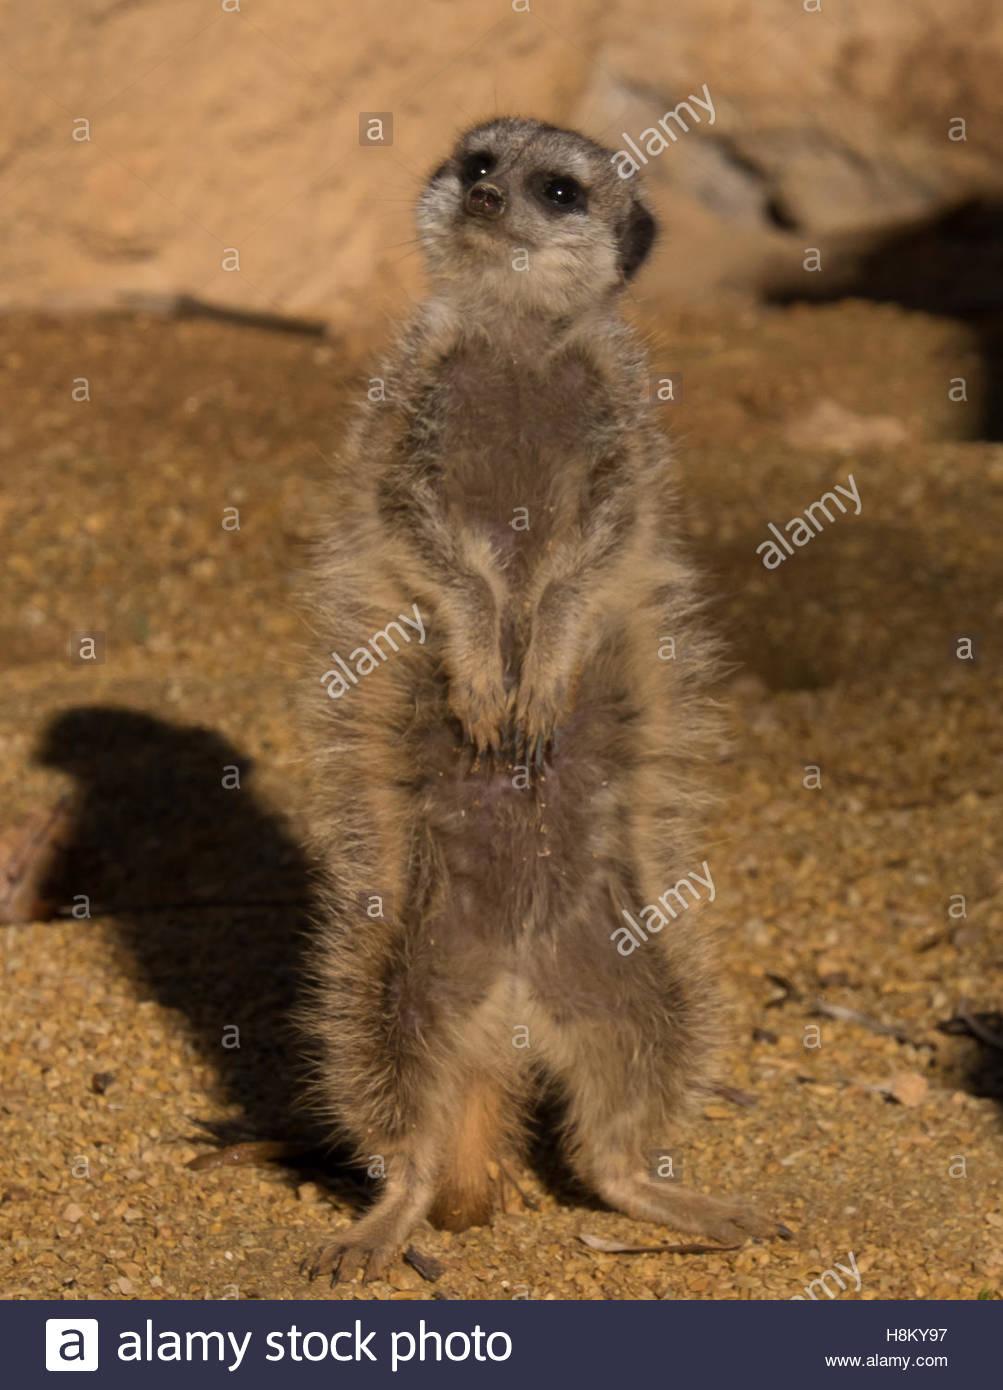 Turin, Italy. 12 november, 2016. ZOOM Zoo. Suricata suricatta The Meerkat (Suricata suricatta Schreber, 1776).Mongoose - Stock Image